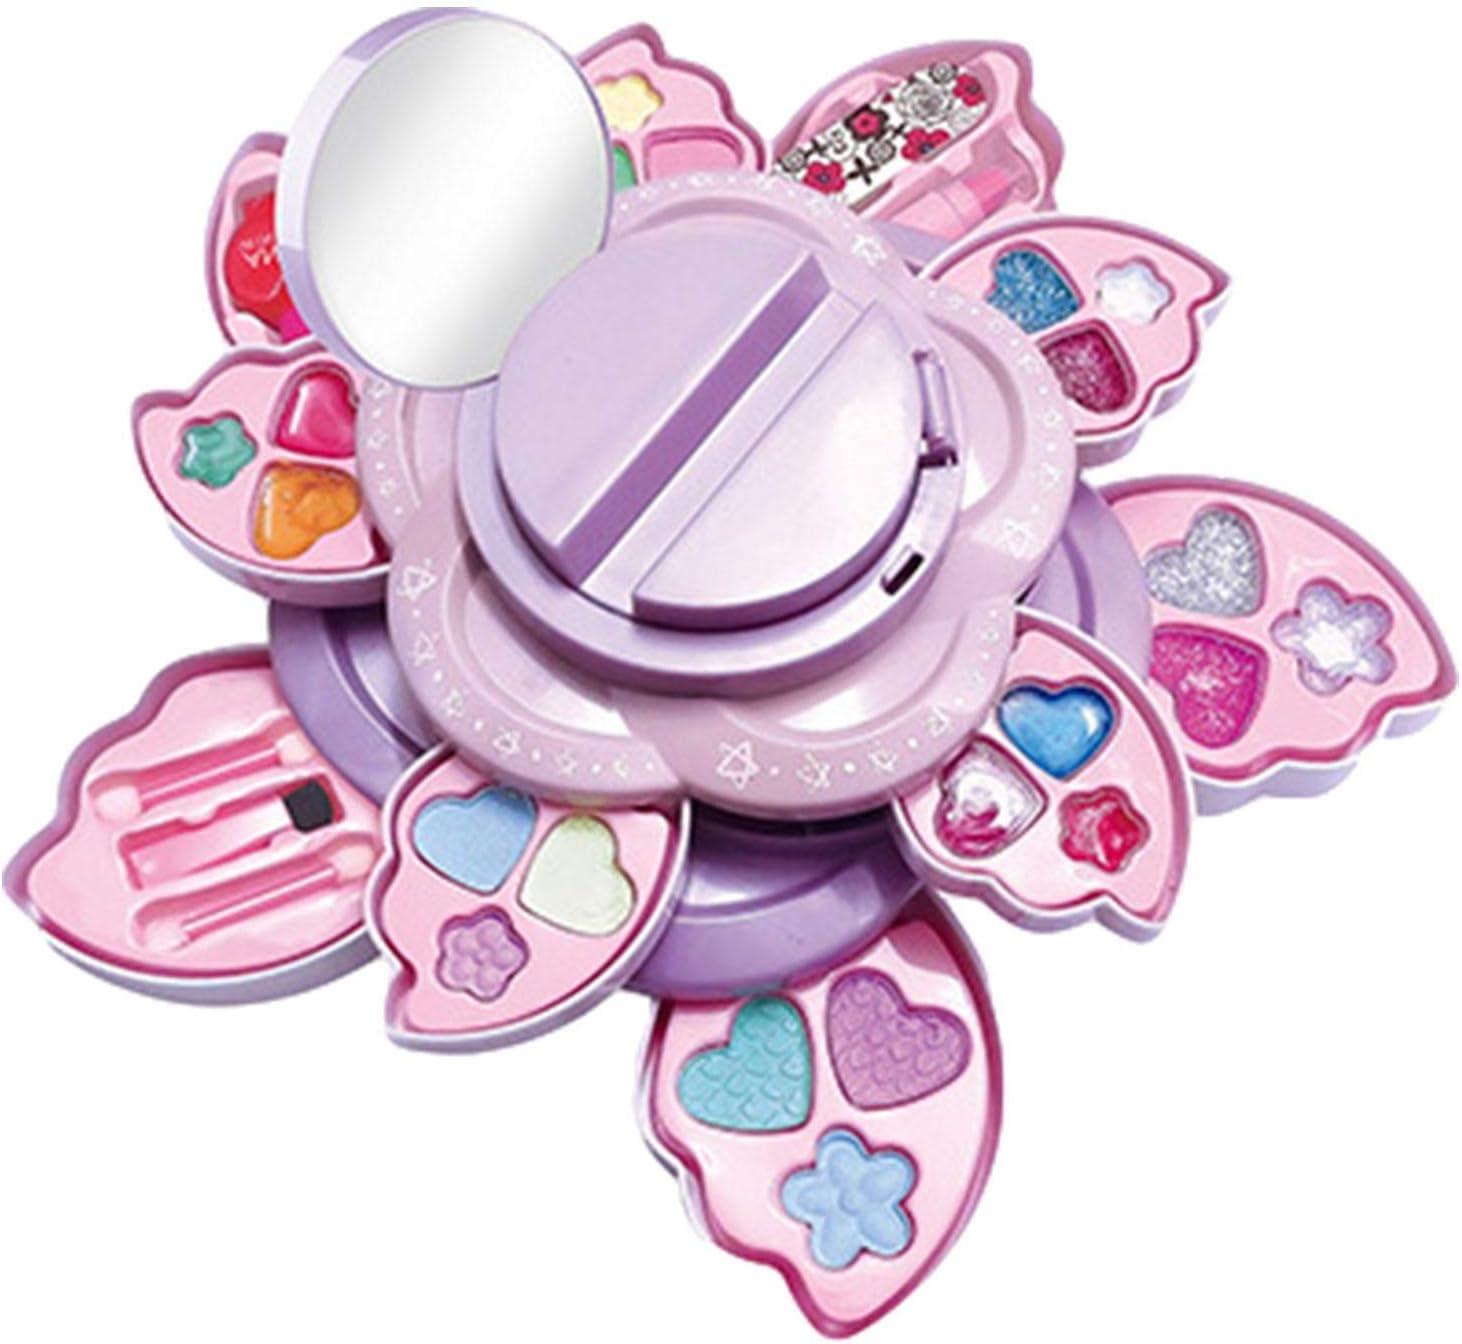 A Kids Super intense SALE Makeup Toy Kit for Set Cosmetic Play Girls 2021 model Mak Pretend